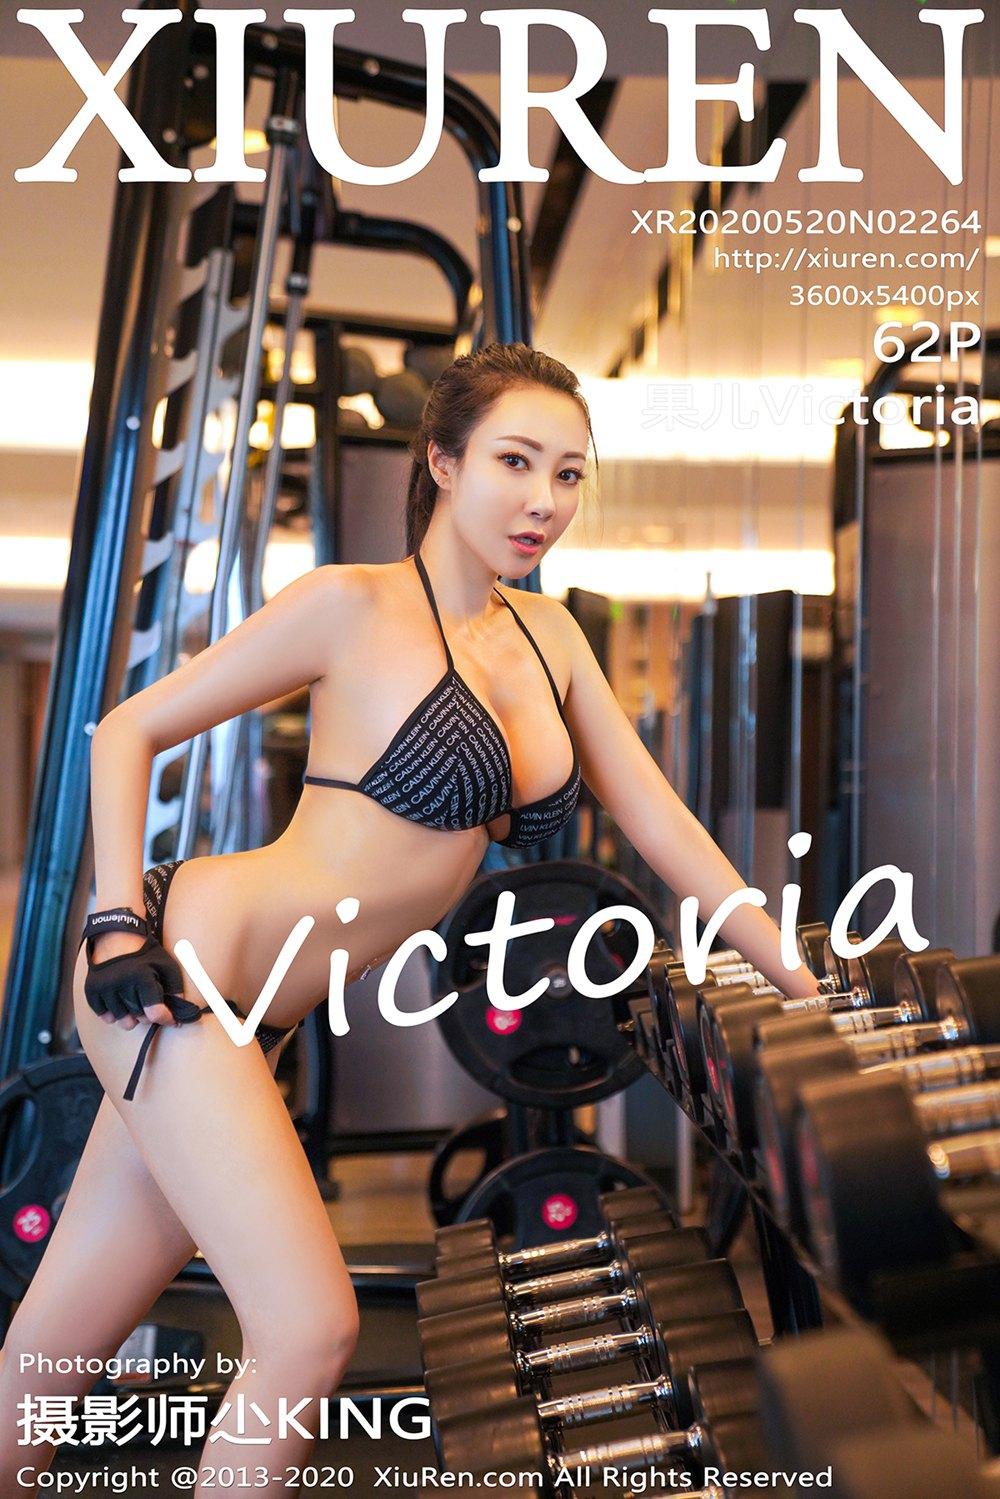 [XiuRen秀人网] 2020.05.20 No.2264 果儿Victoria 健身房主题写真 [62 1P] -第1张